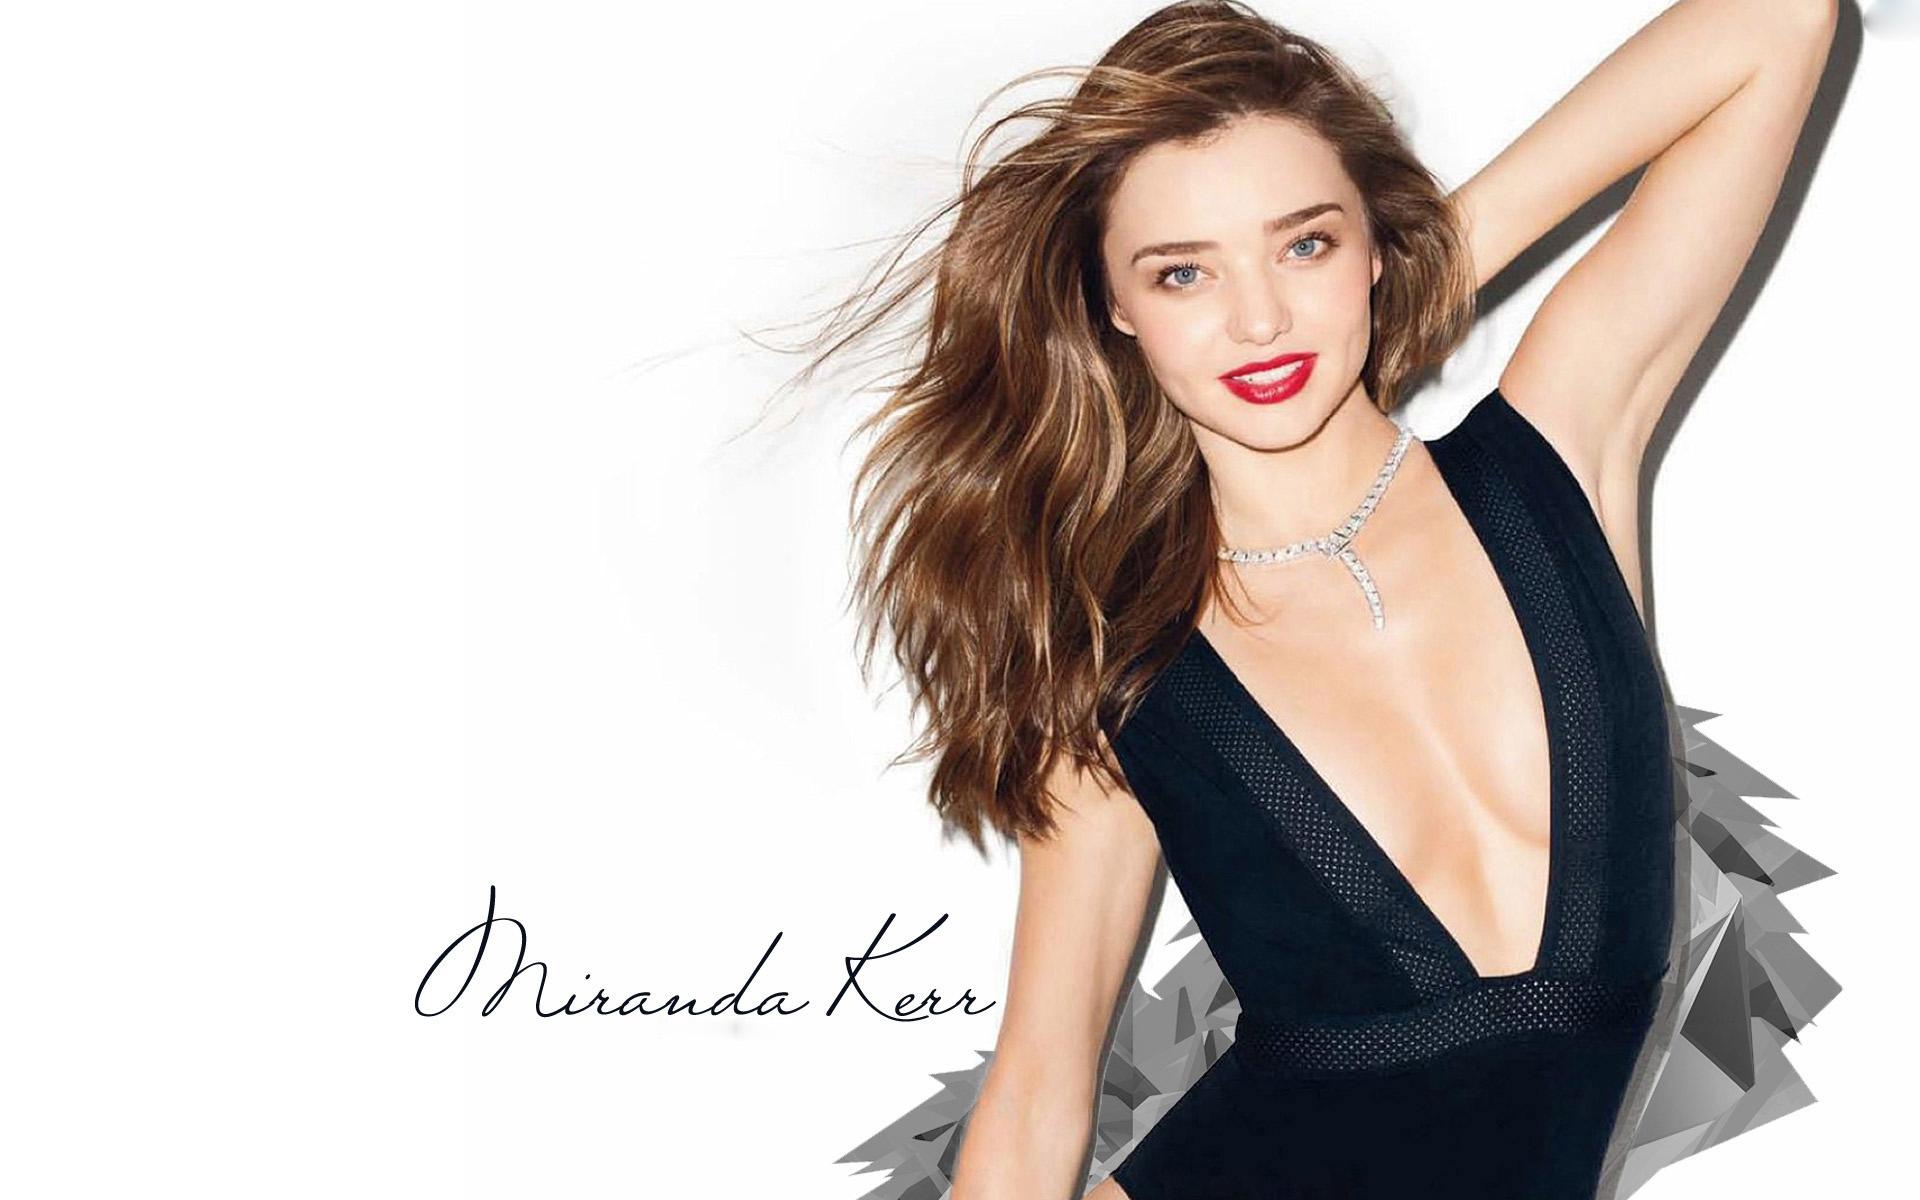 Miranda kerr 2015 wallpaper Gallery 1920x1200